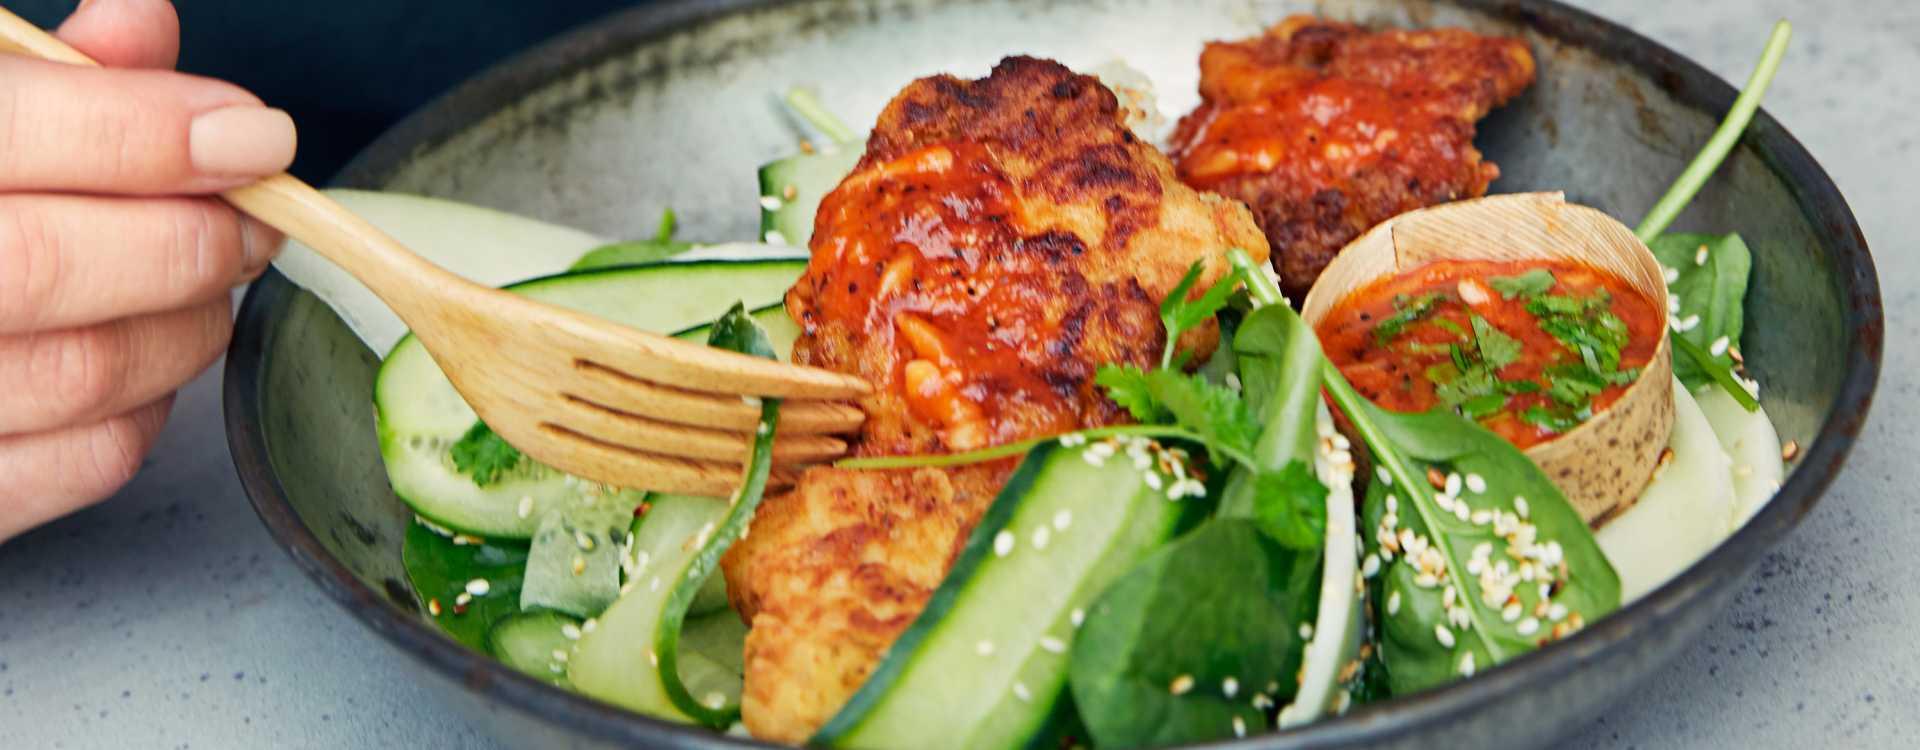 Sprøstekt kyllinglårfilet med sursøt saus og honningmelon